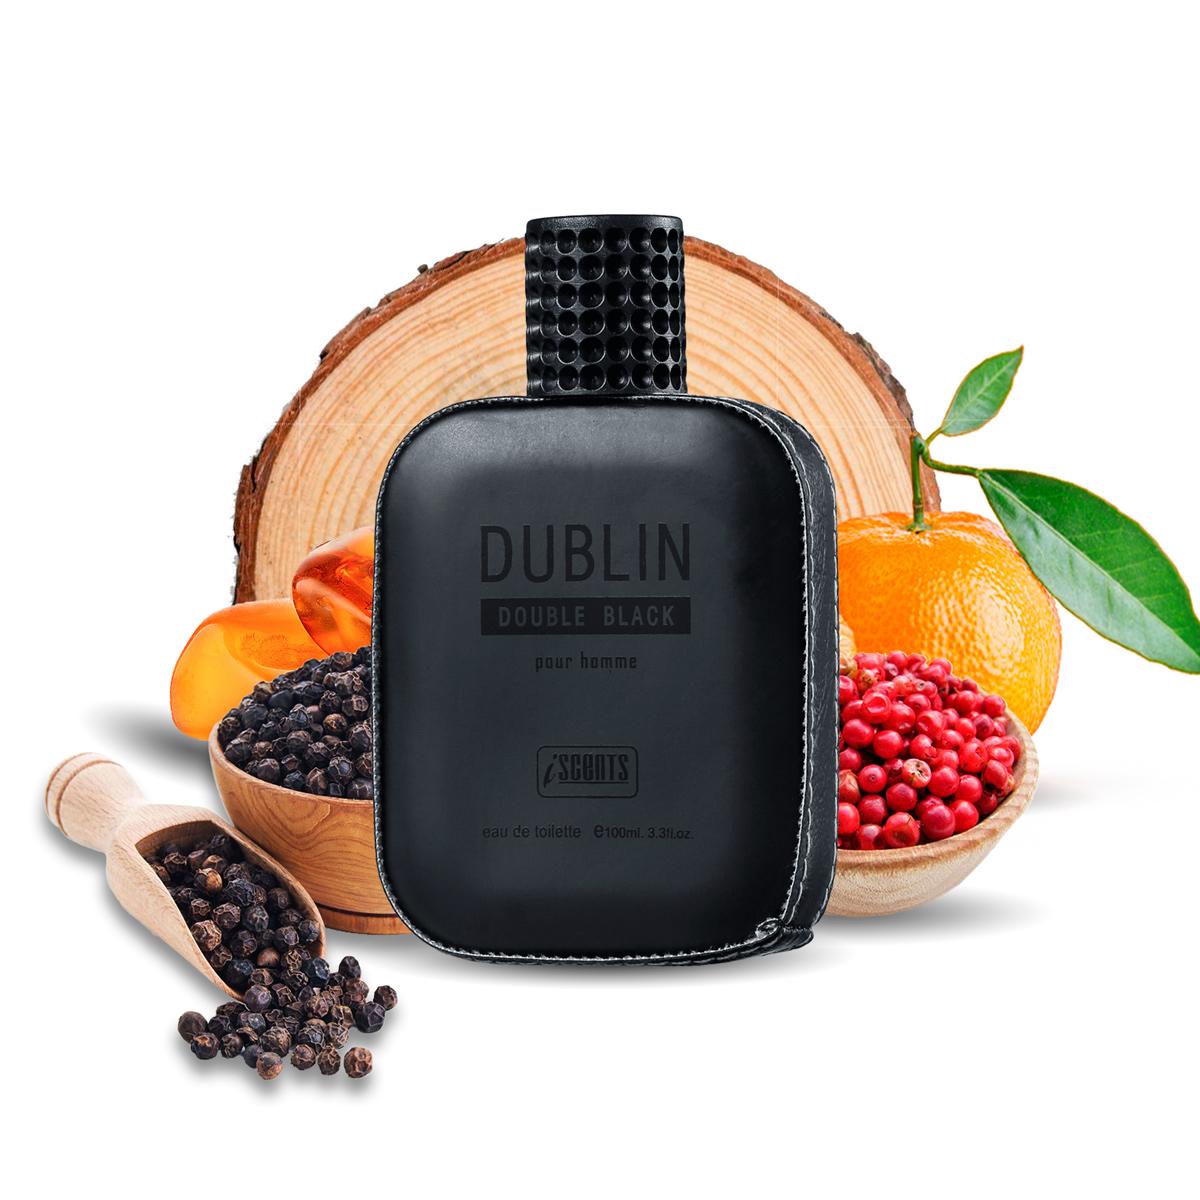 Kit 2 Perfumes Importados Belle e Dublin I Scents